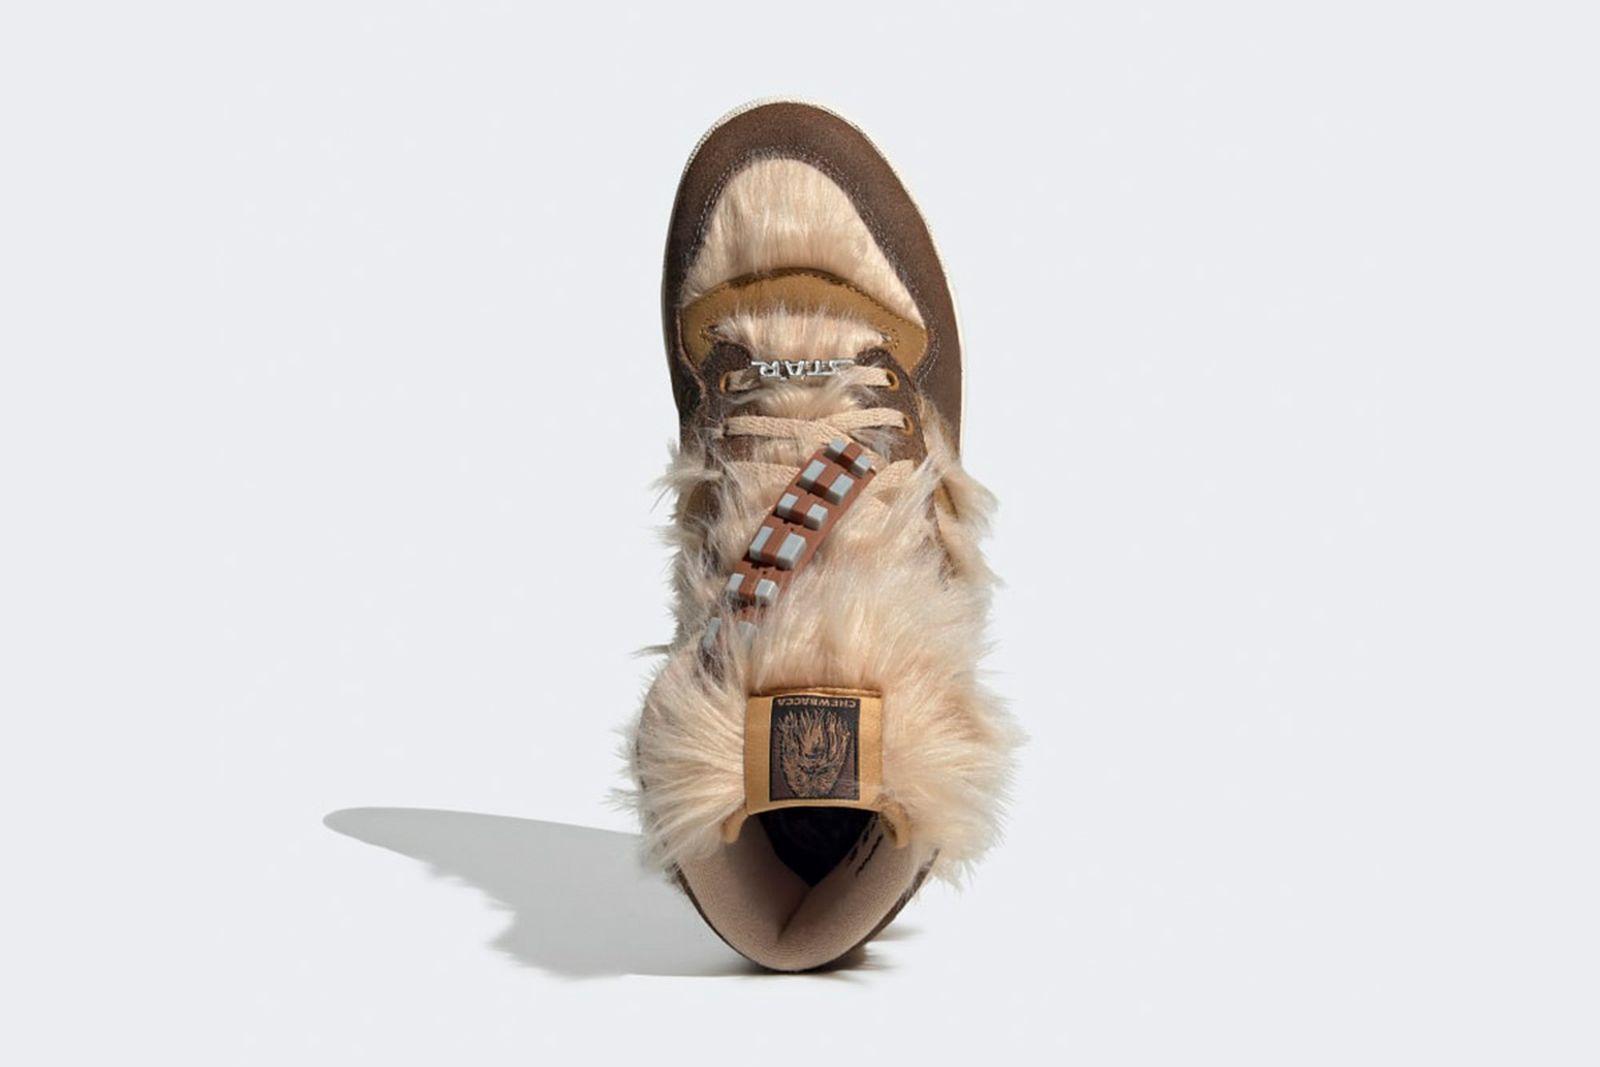 star-wars-adidas-rivalry-hi-chewbacca-release-date-price-03